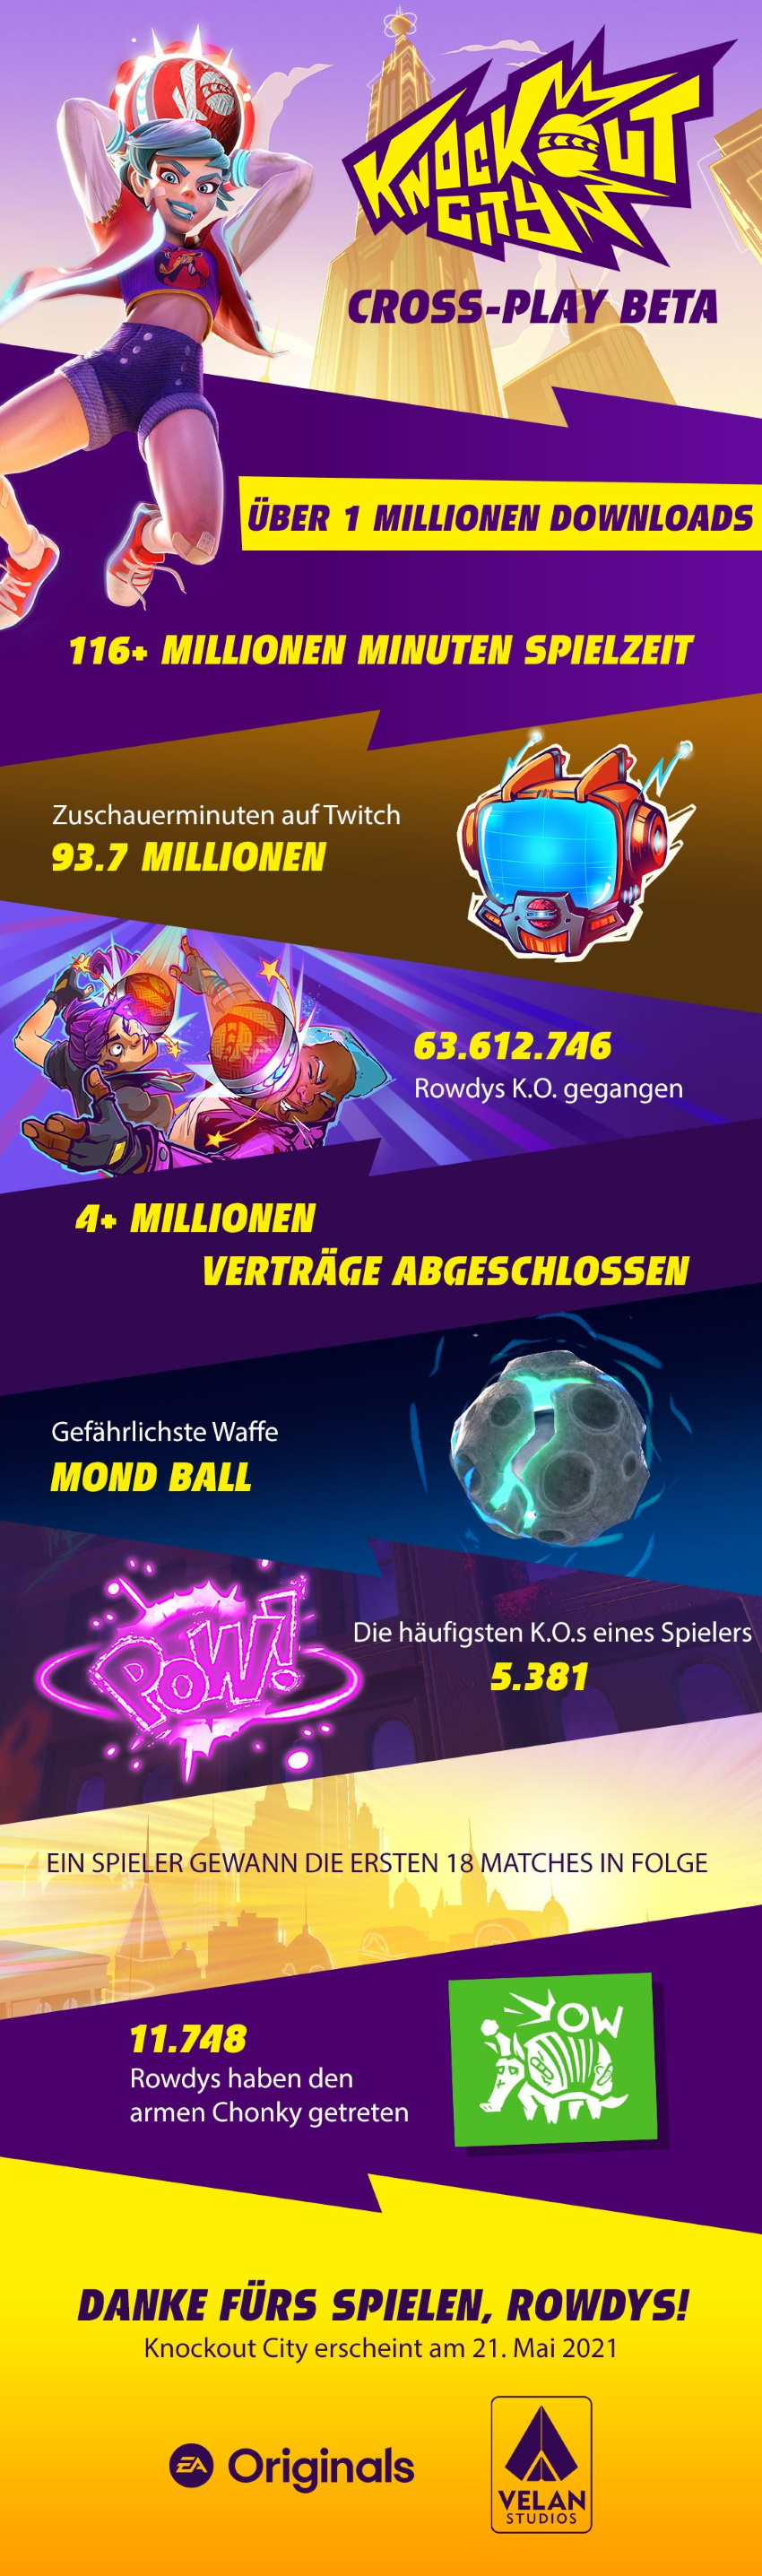 knoc_infographic_crossplaybeta